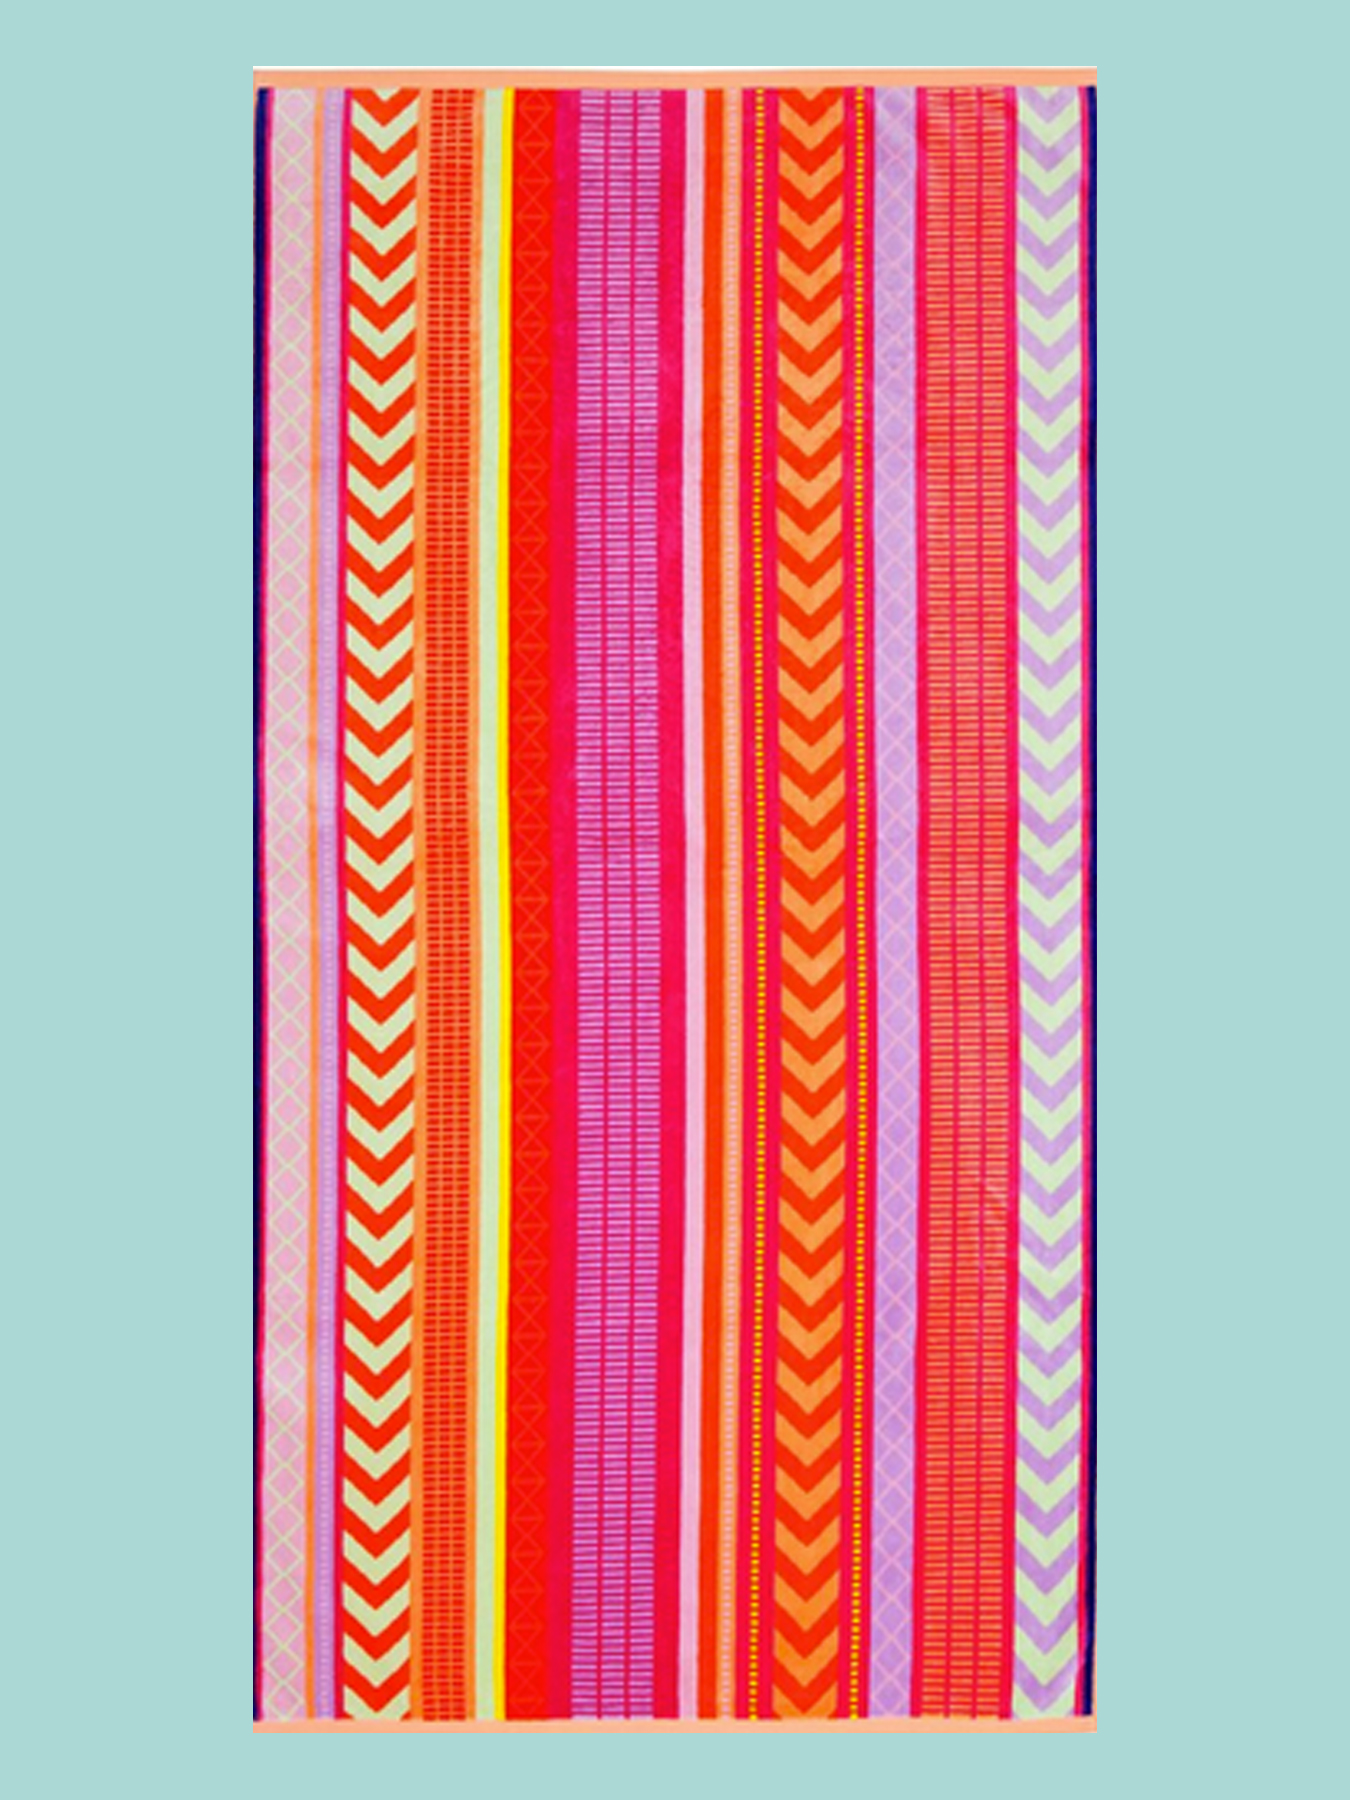 BEACH TOWEL: Striped Towel